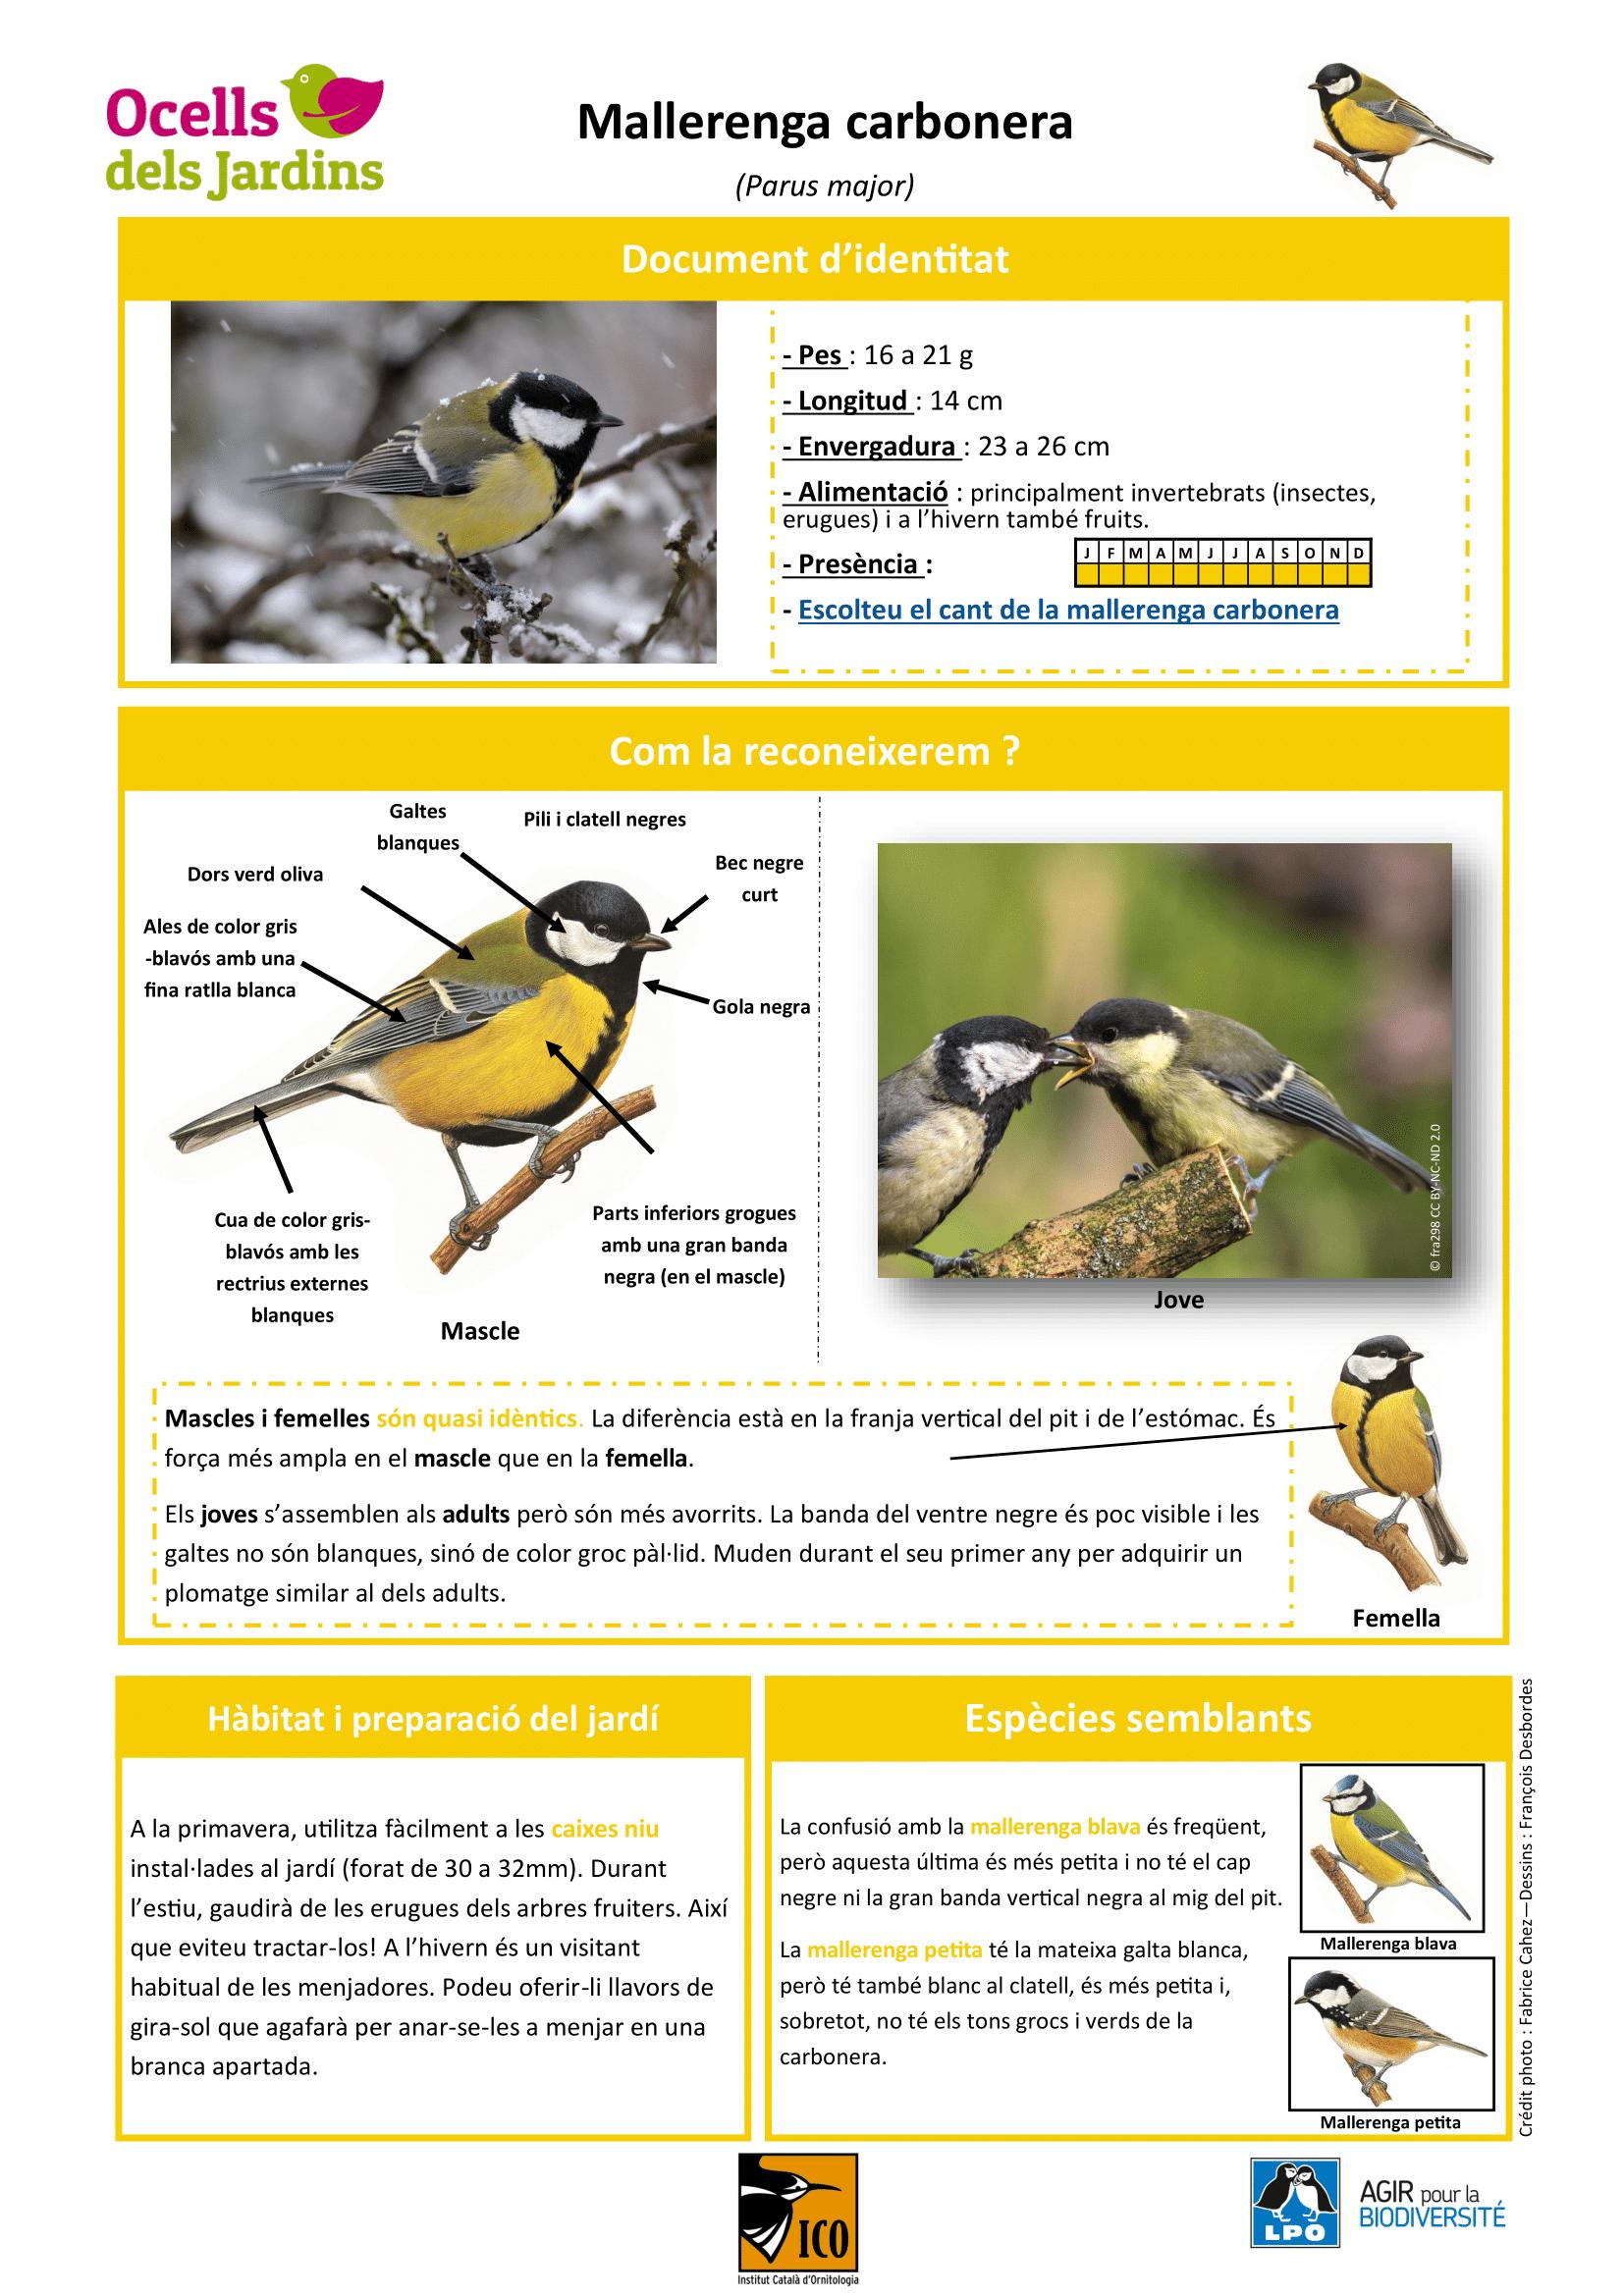 https://cdnfiles1.biolovision.net/www.ocellsdelsjardins.cat/userfiles/Mallerengacarbonera-1.png